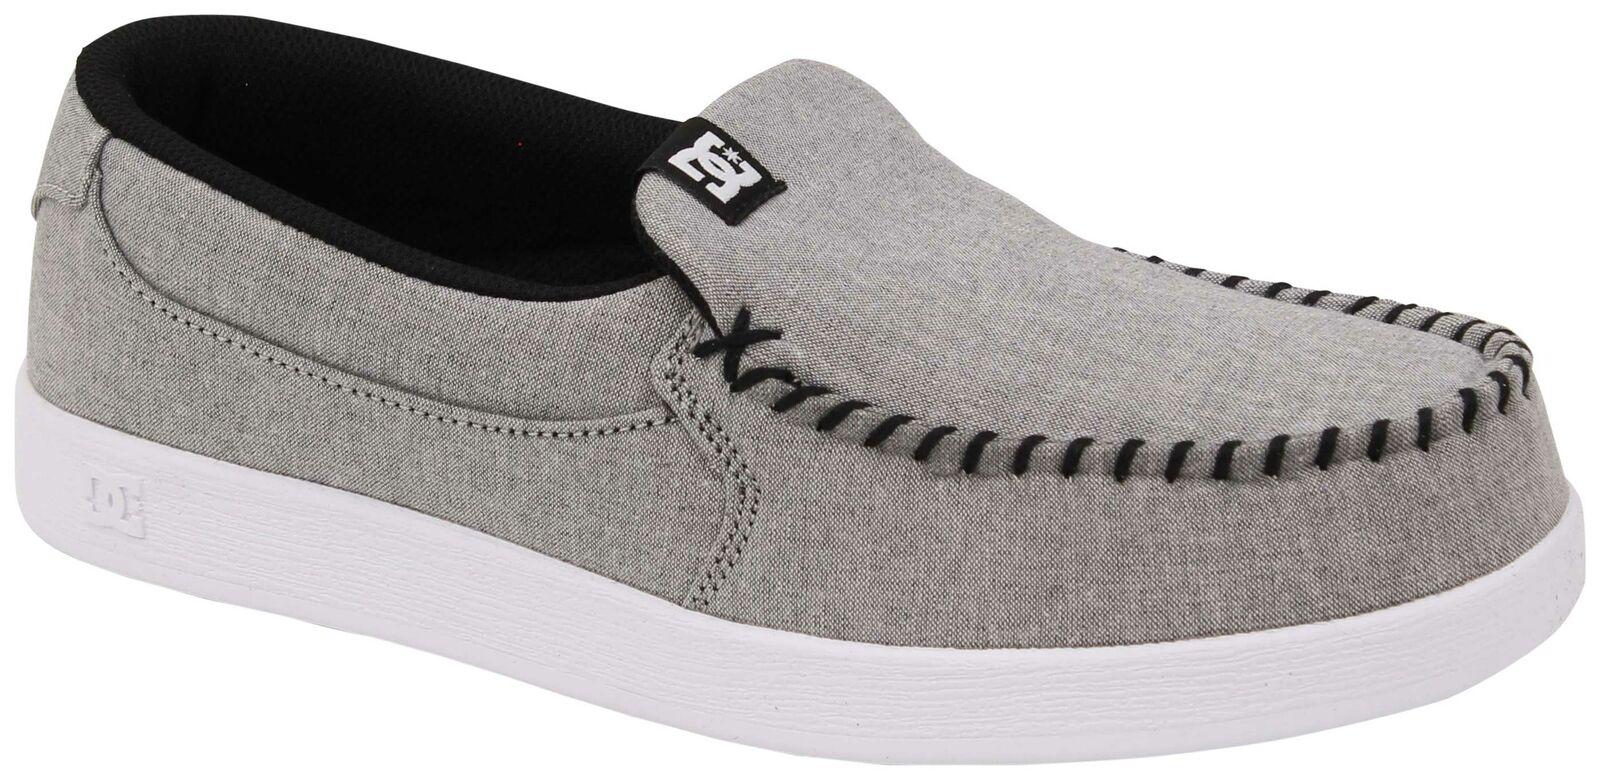 DC Villain TX SE shoes - Heather Grey - New